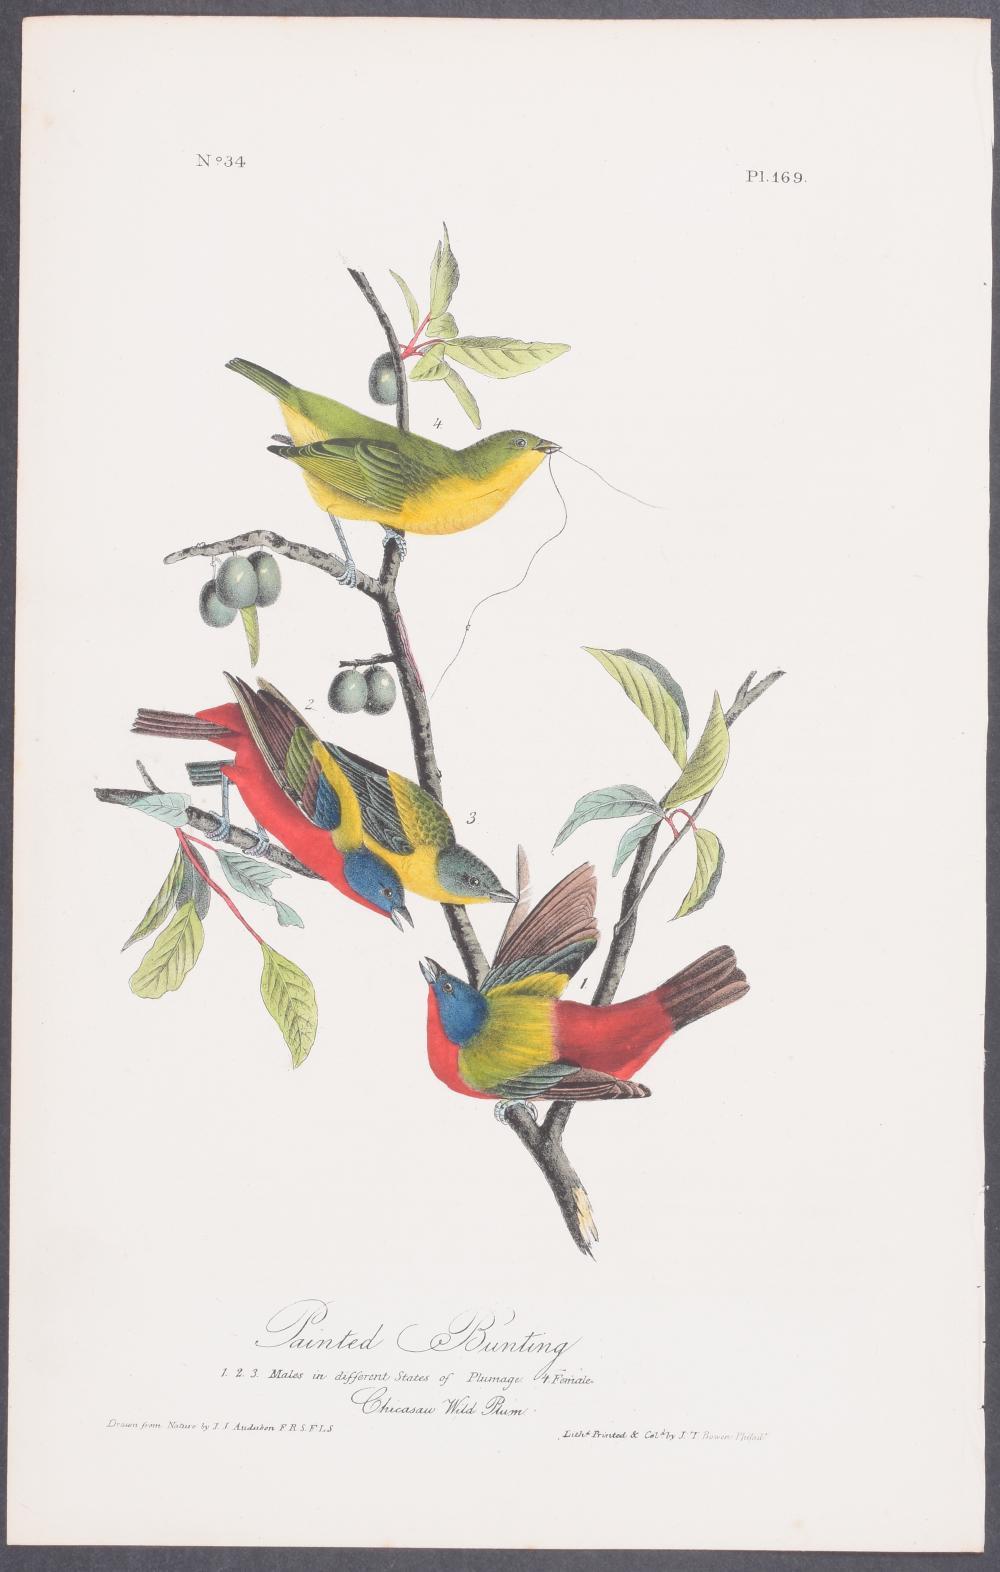 Lot 11112: Audubon - Painted Bunting. 169